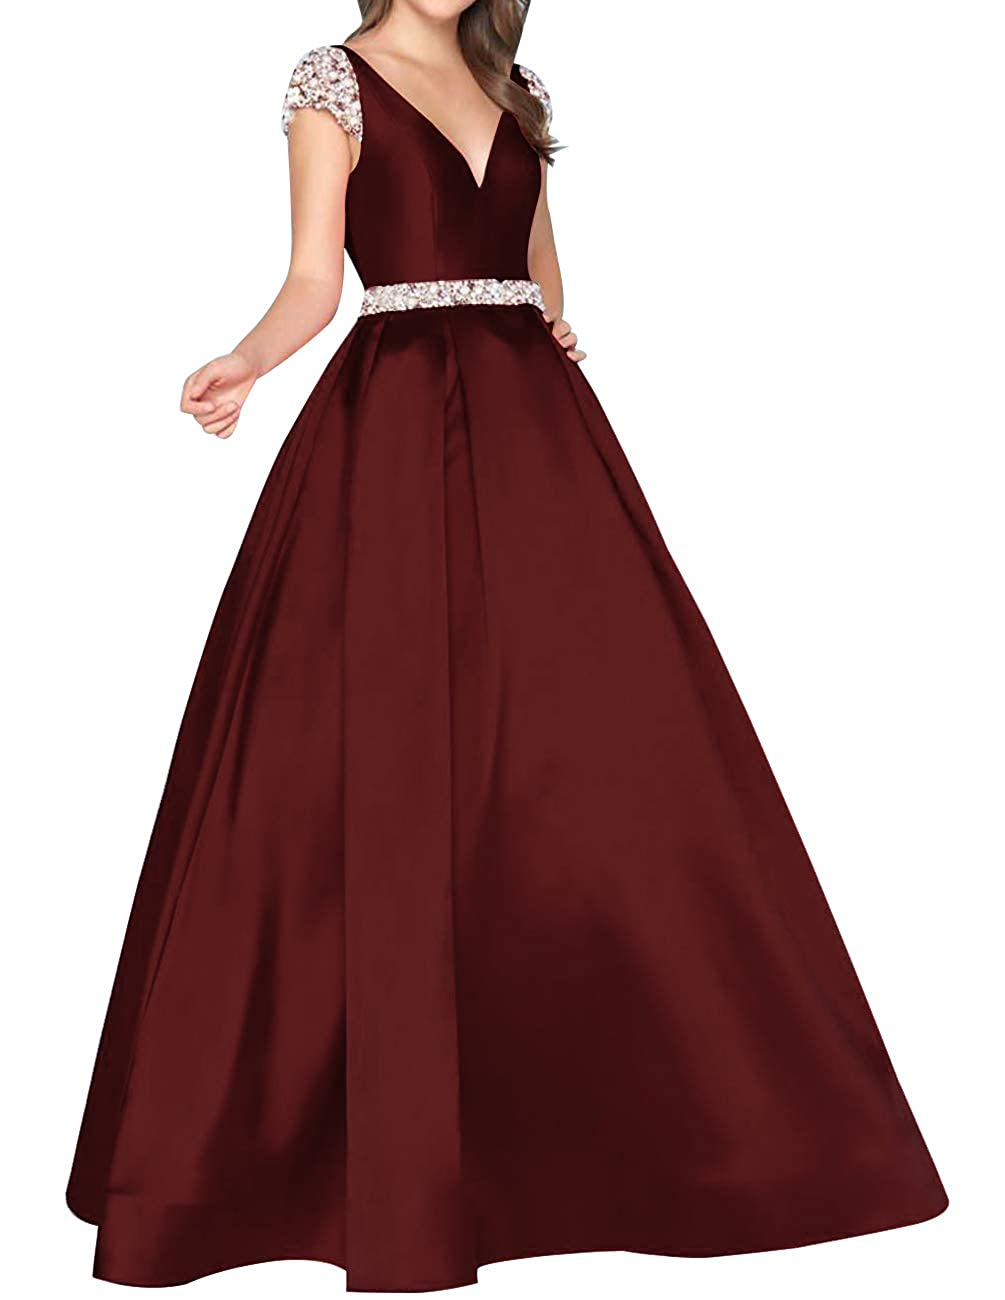 Burgundy Homdor Beaded Prom Dresses Long Cap Sleeve Backless ALine Satin Evening Ball Gowns